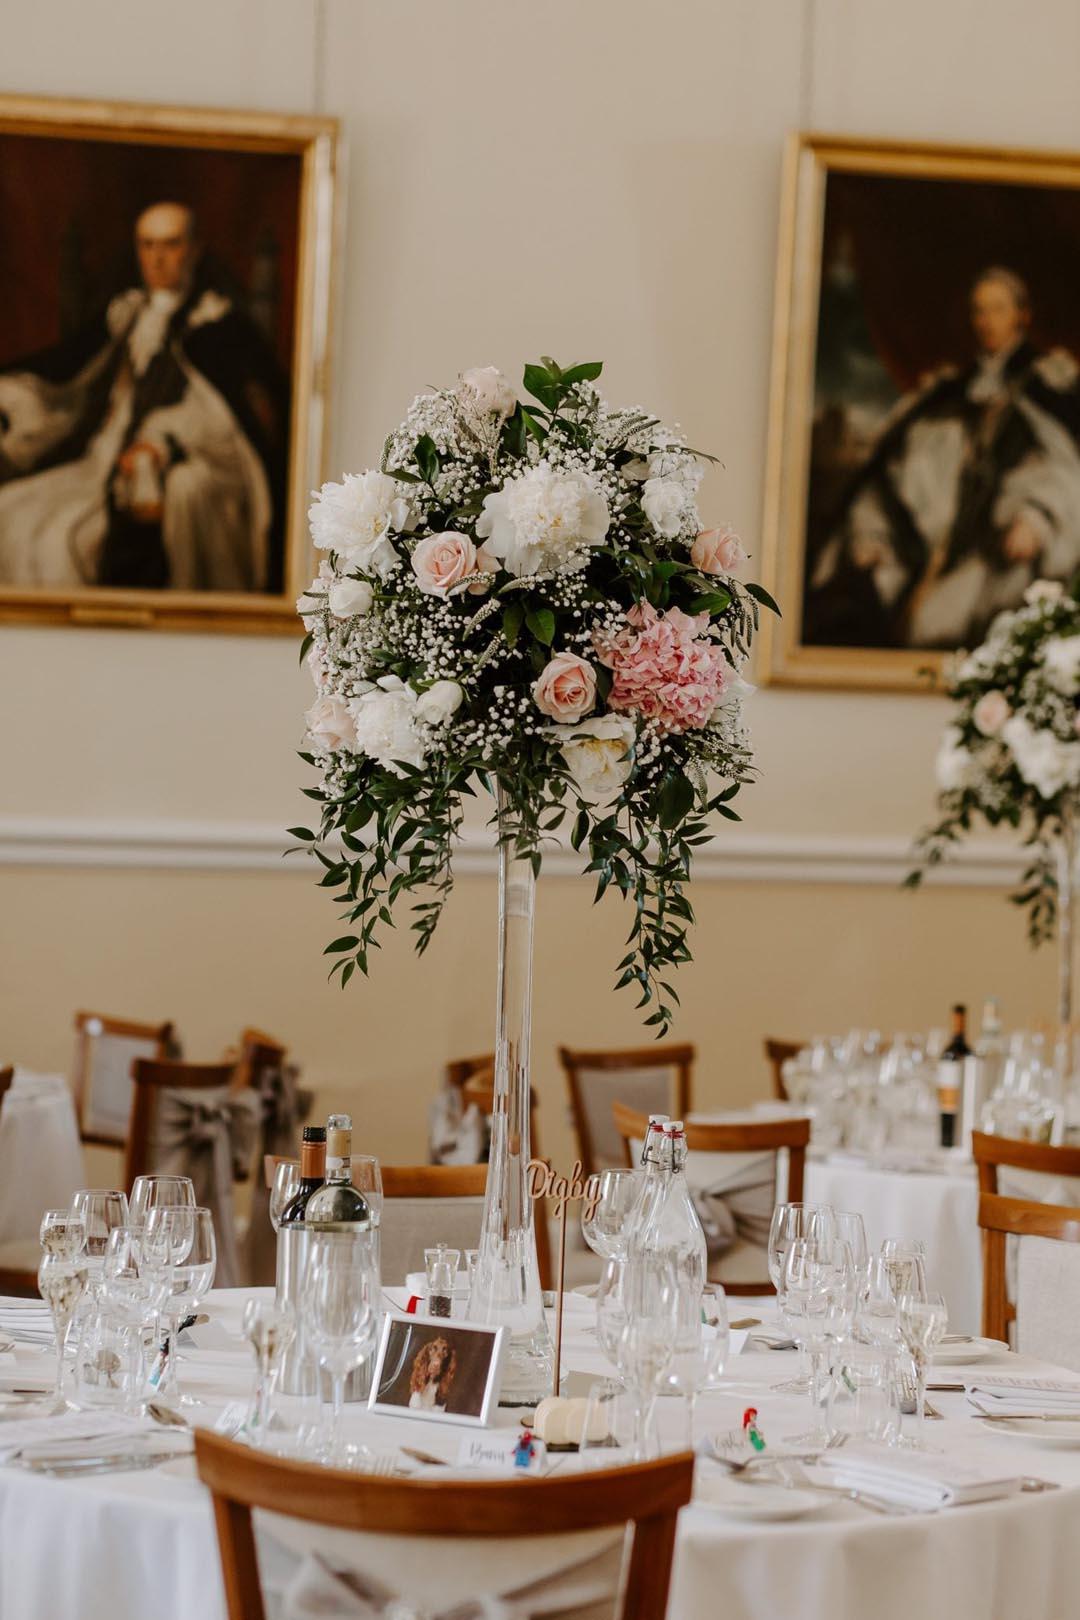 Floral wedding reception table decor at Farnham Castle